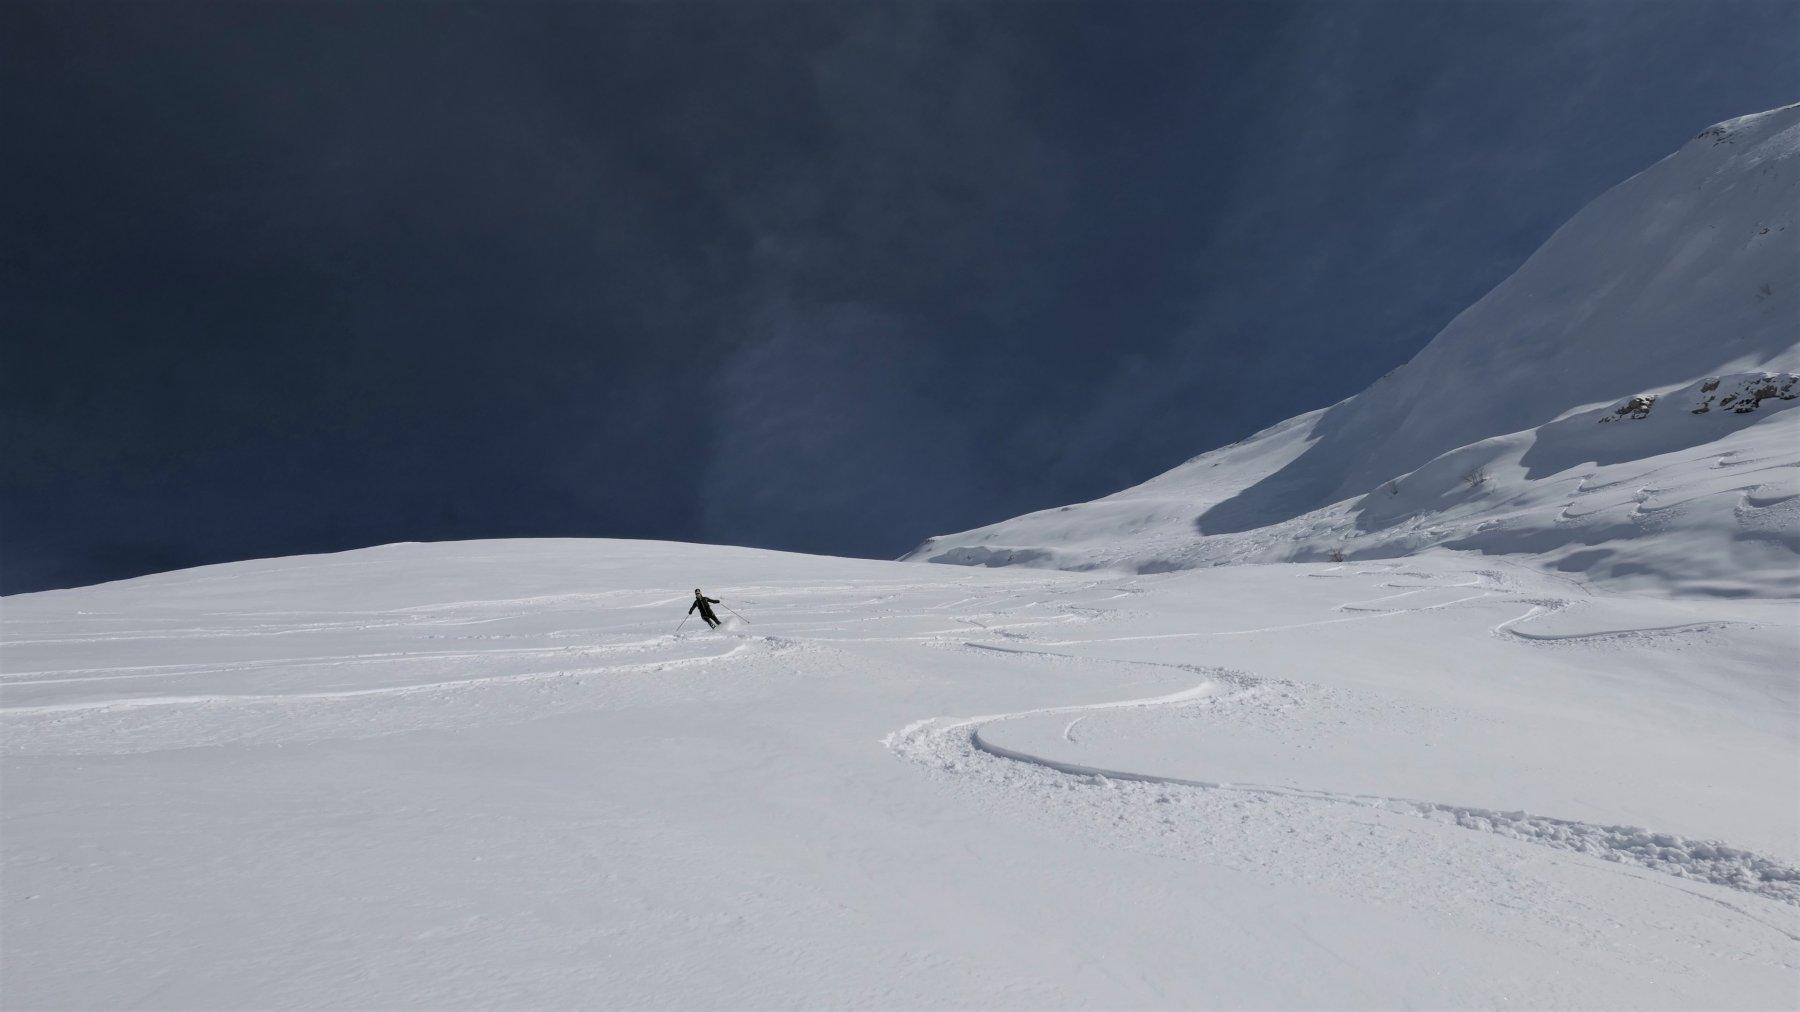 bella sciata